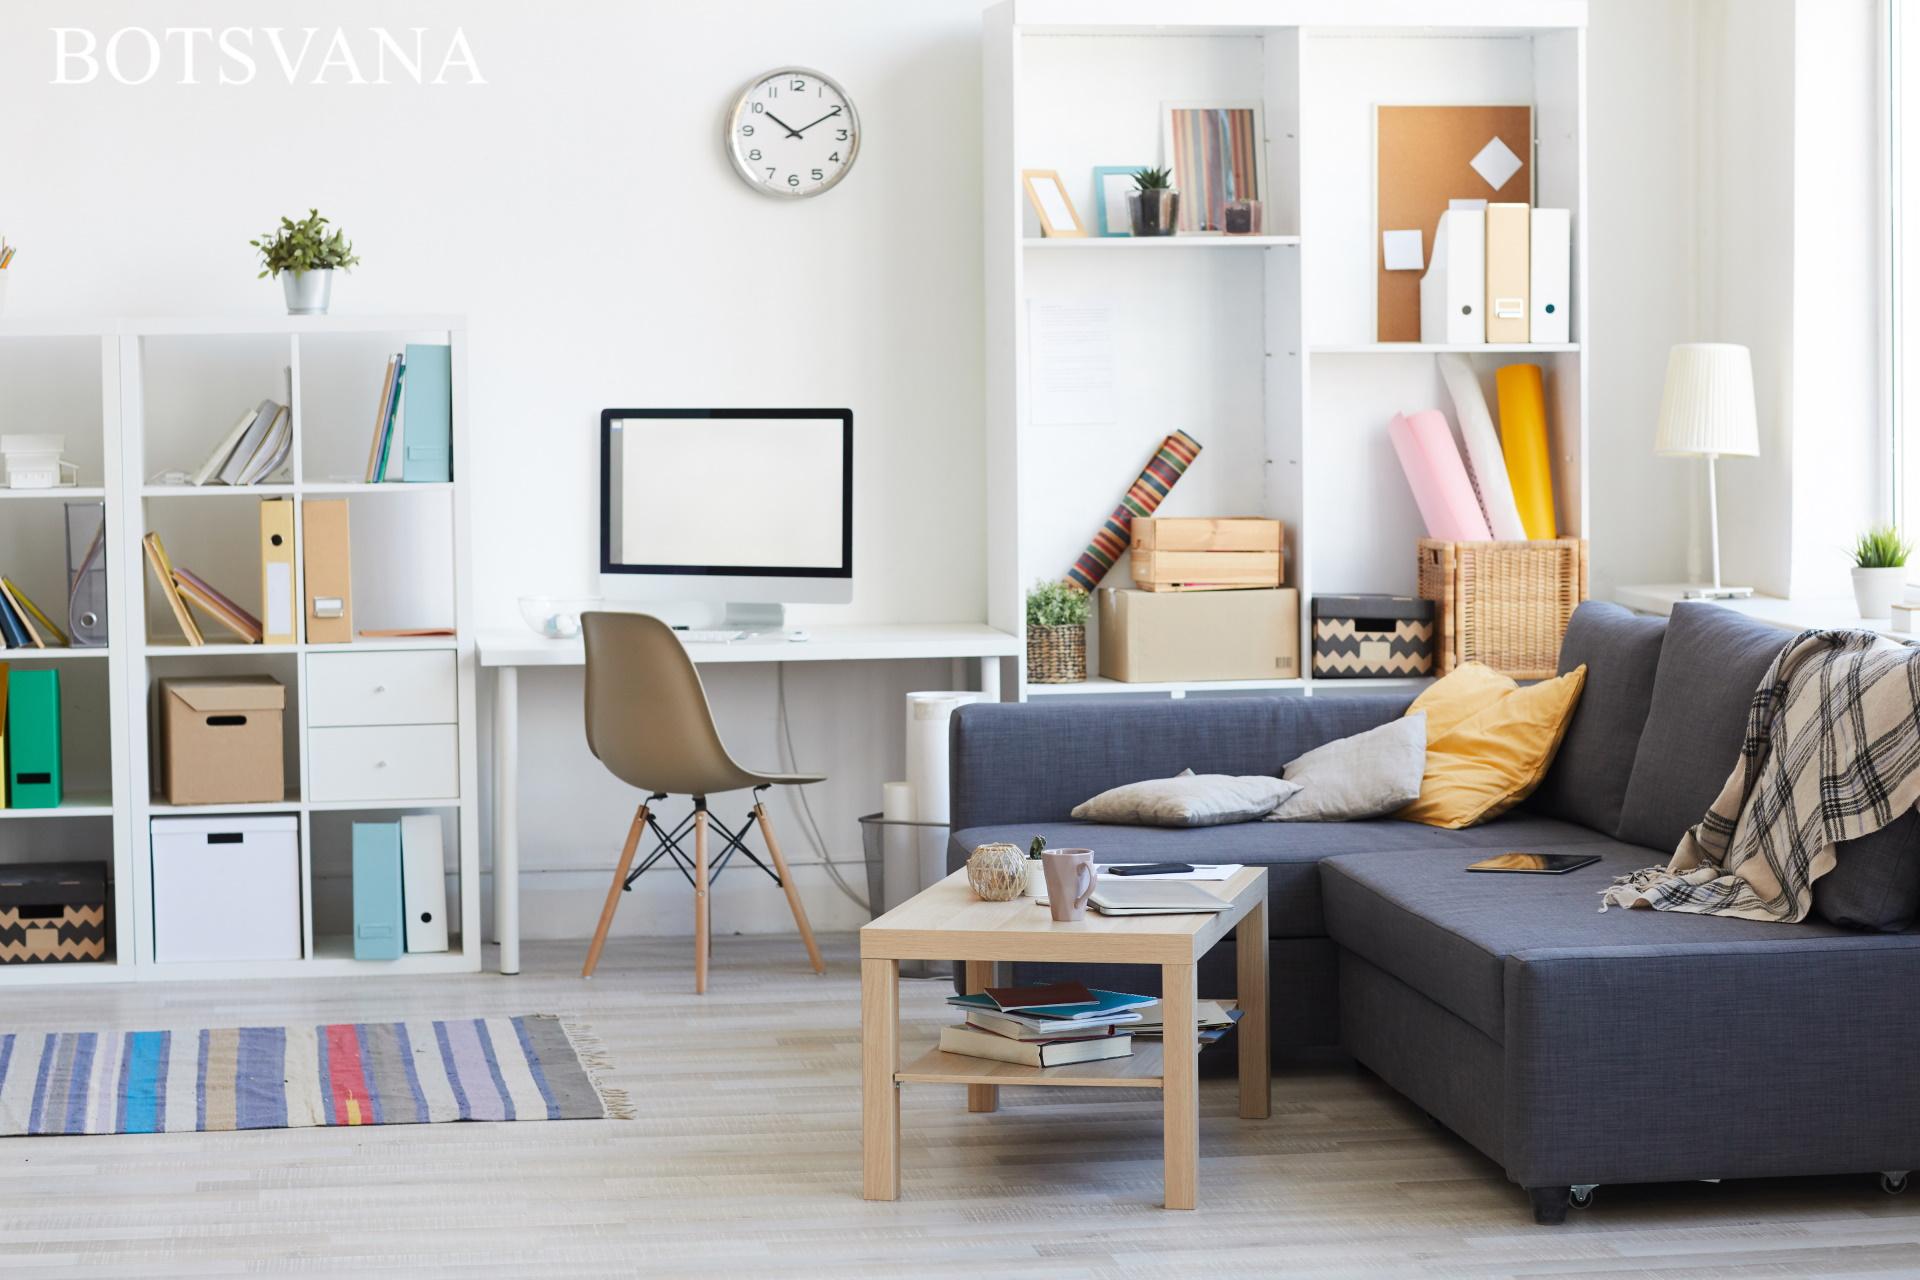 11 ev nasıl dekore edilir - 1+1 Ev Nasıl Dekore Edilir?